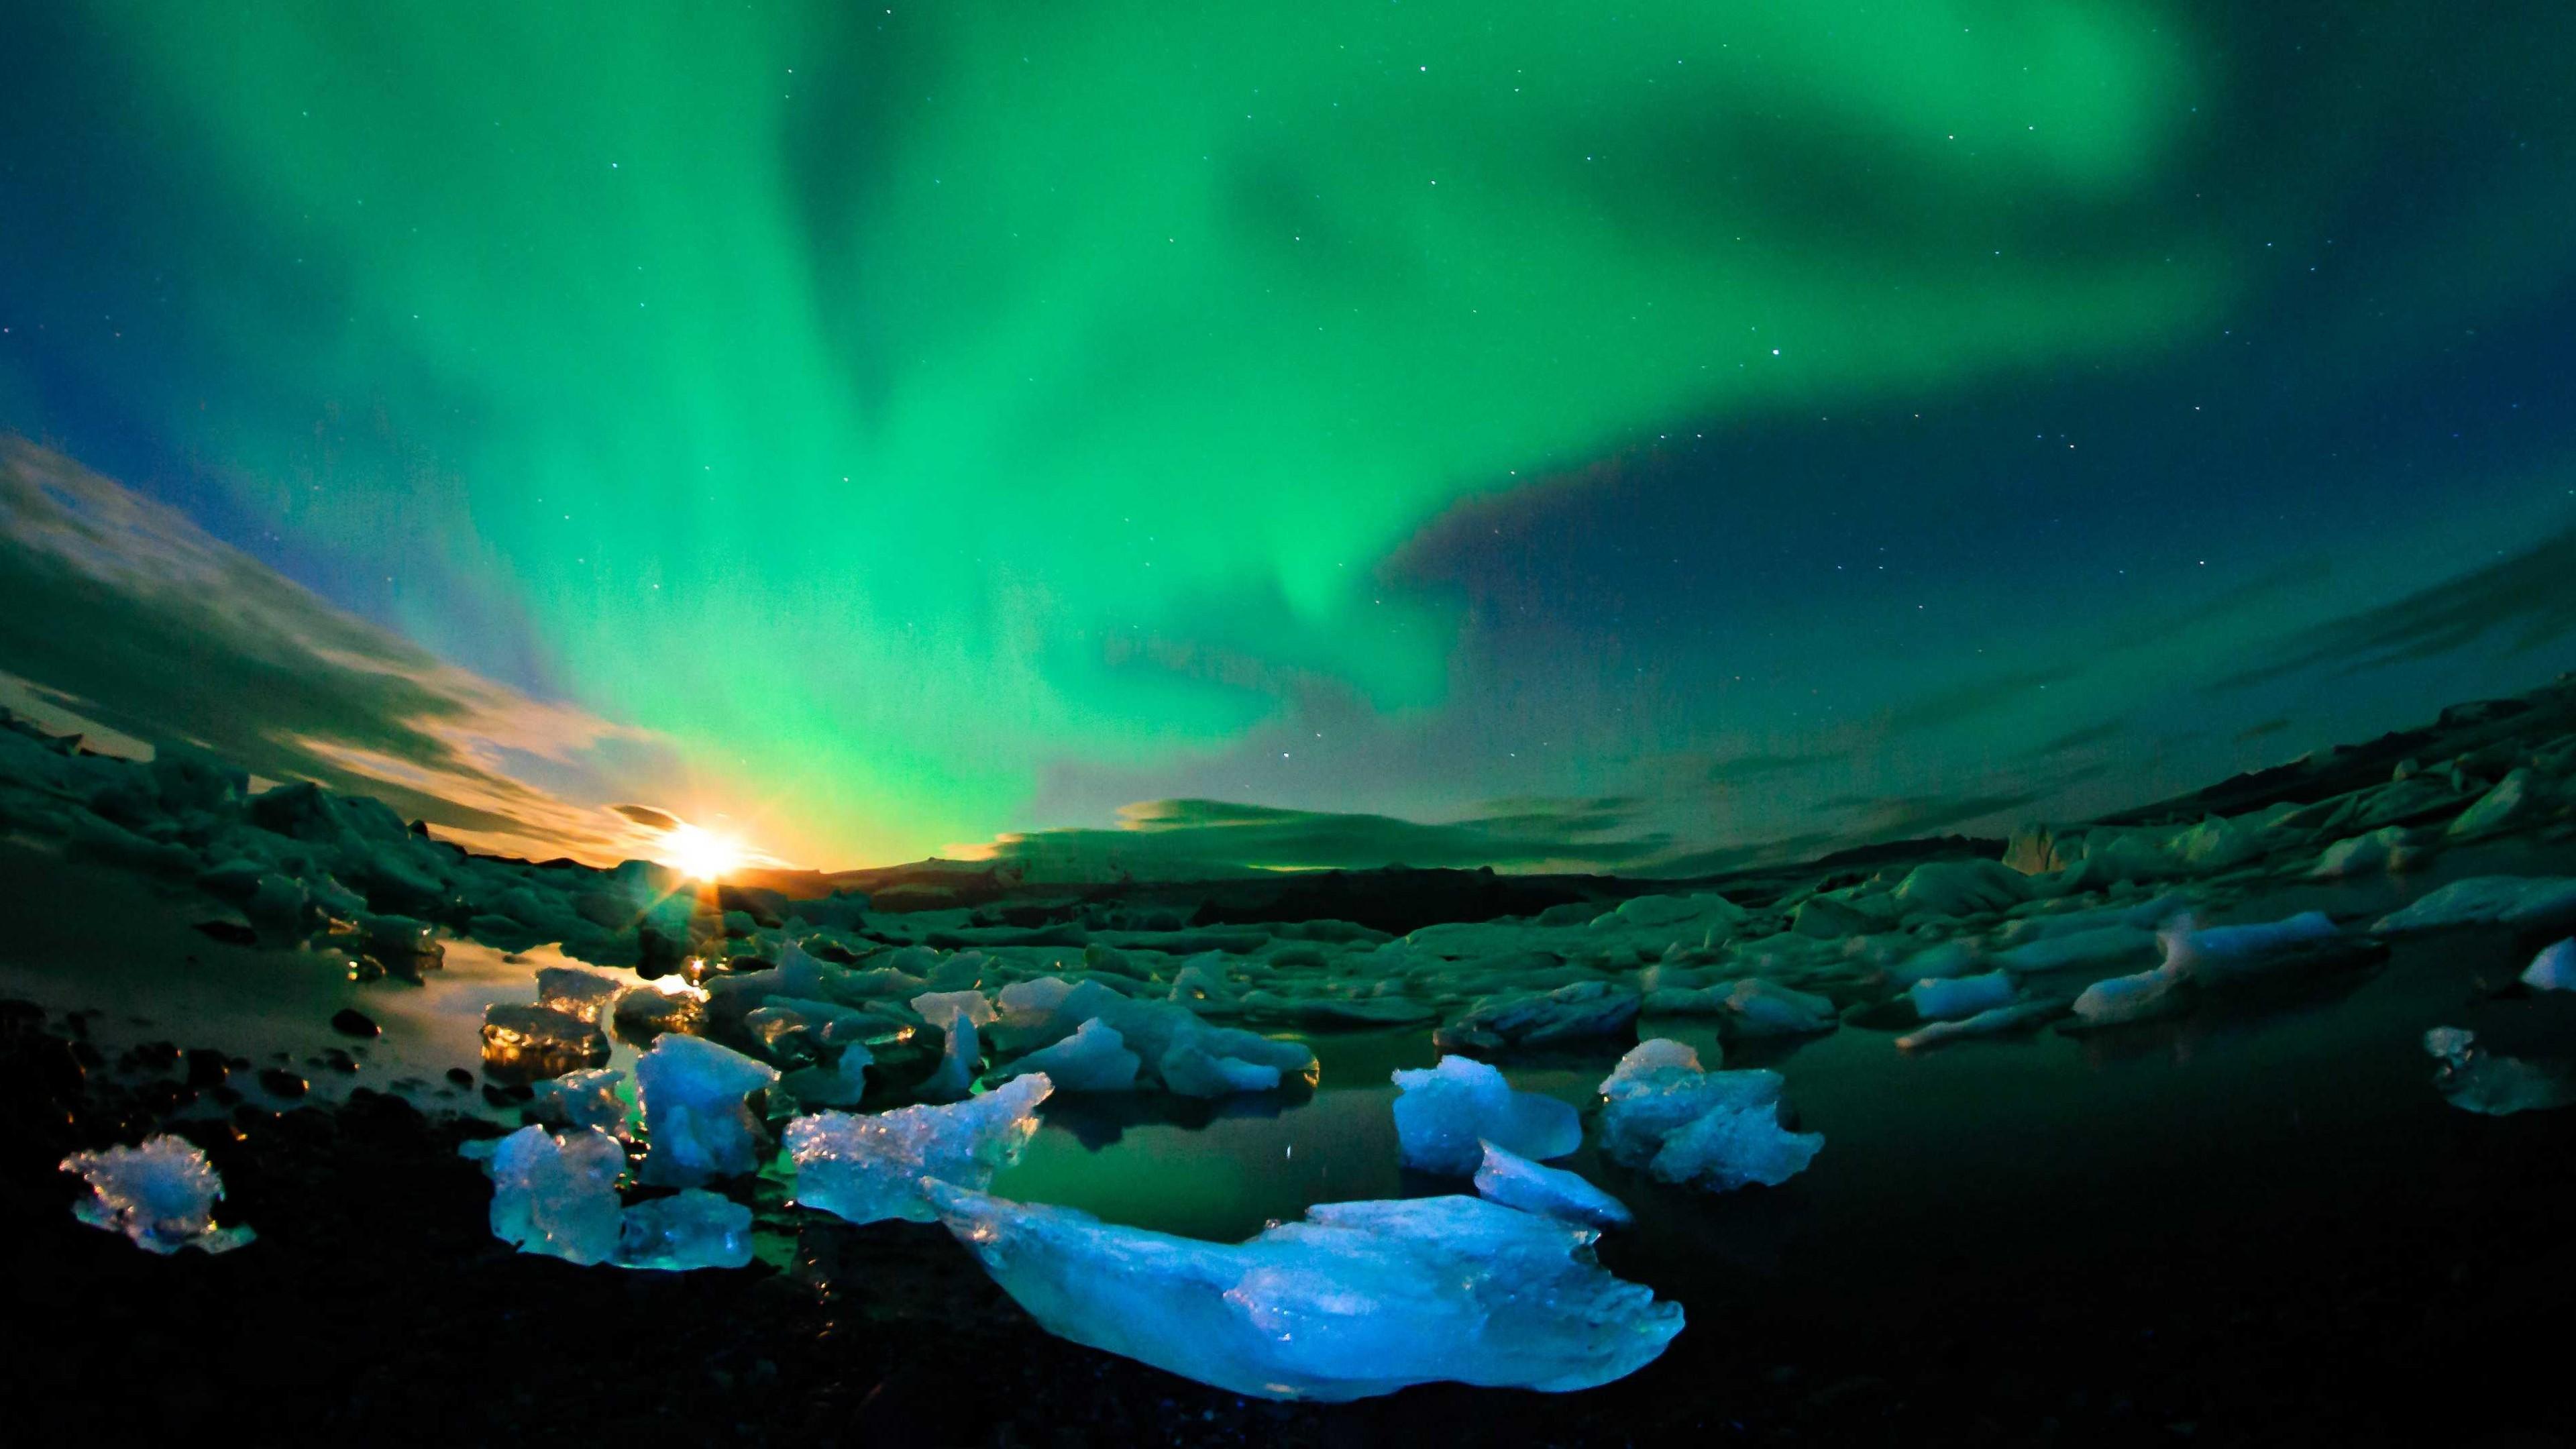 Wallpaper Iceland 4k Hd Wallpaper Northern Lights Sky